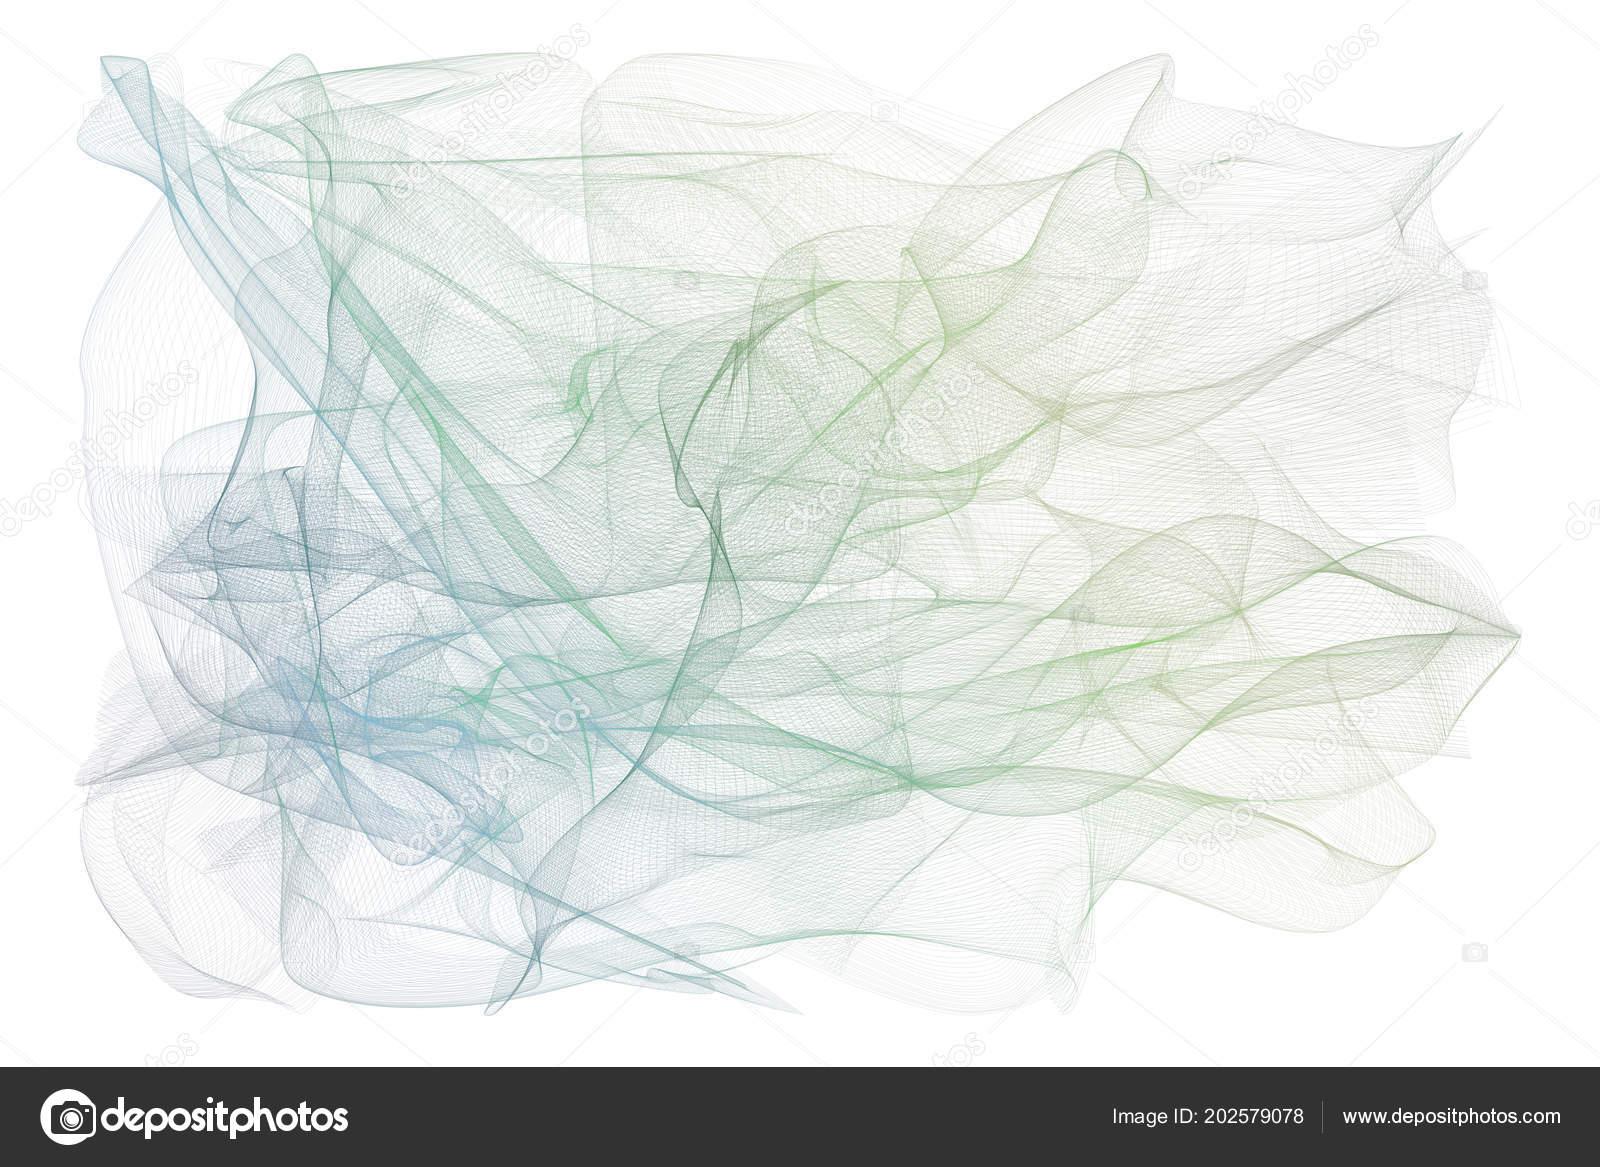 Illustrations Smoky Line Art Good Web Page Wallpaper Graphic Design — Stock Photo